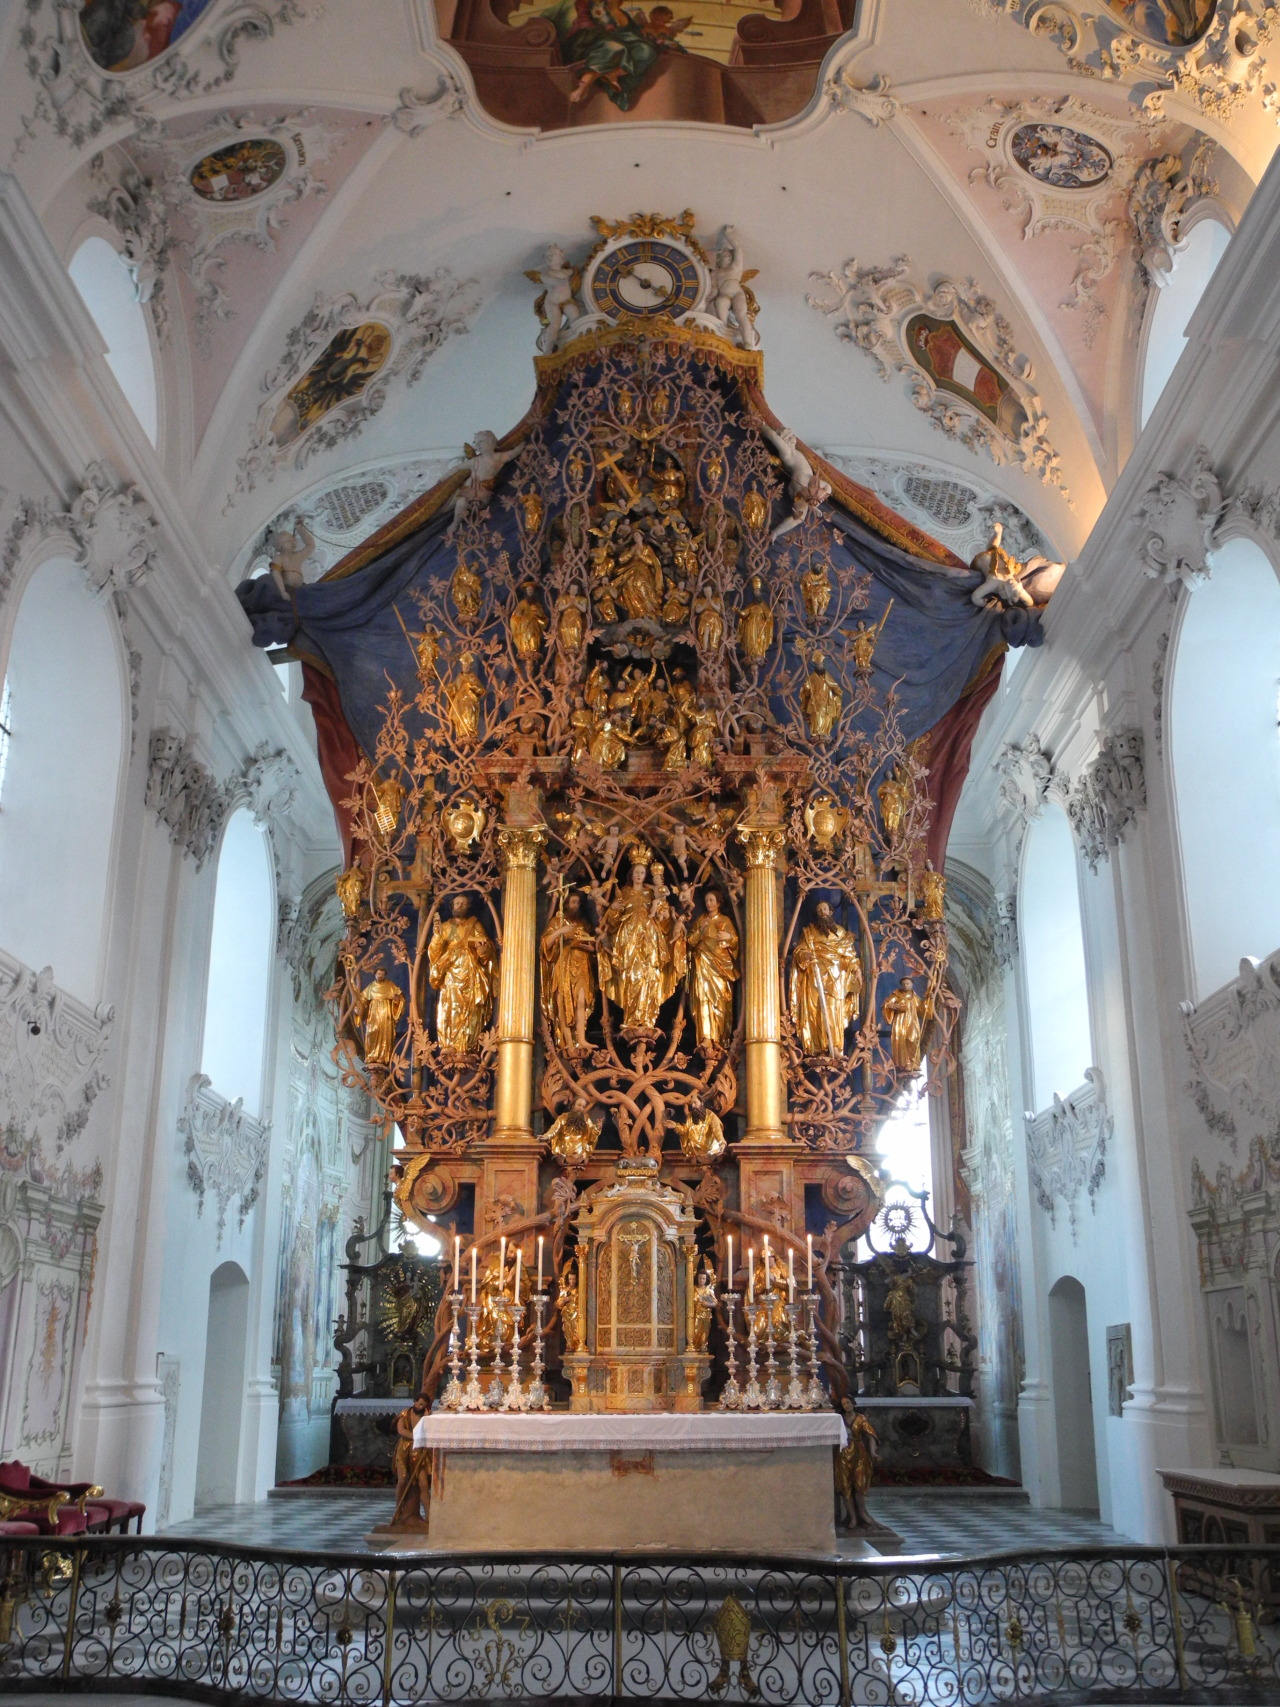 signorcasaubon:High Altar of Stift Stams (Stams Monastery), Tyrol, Austria